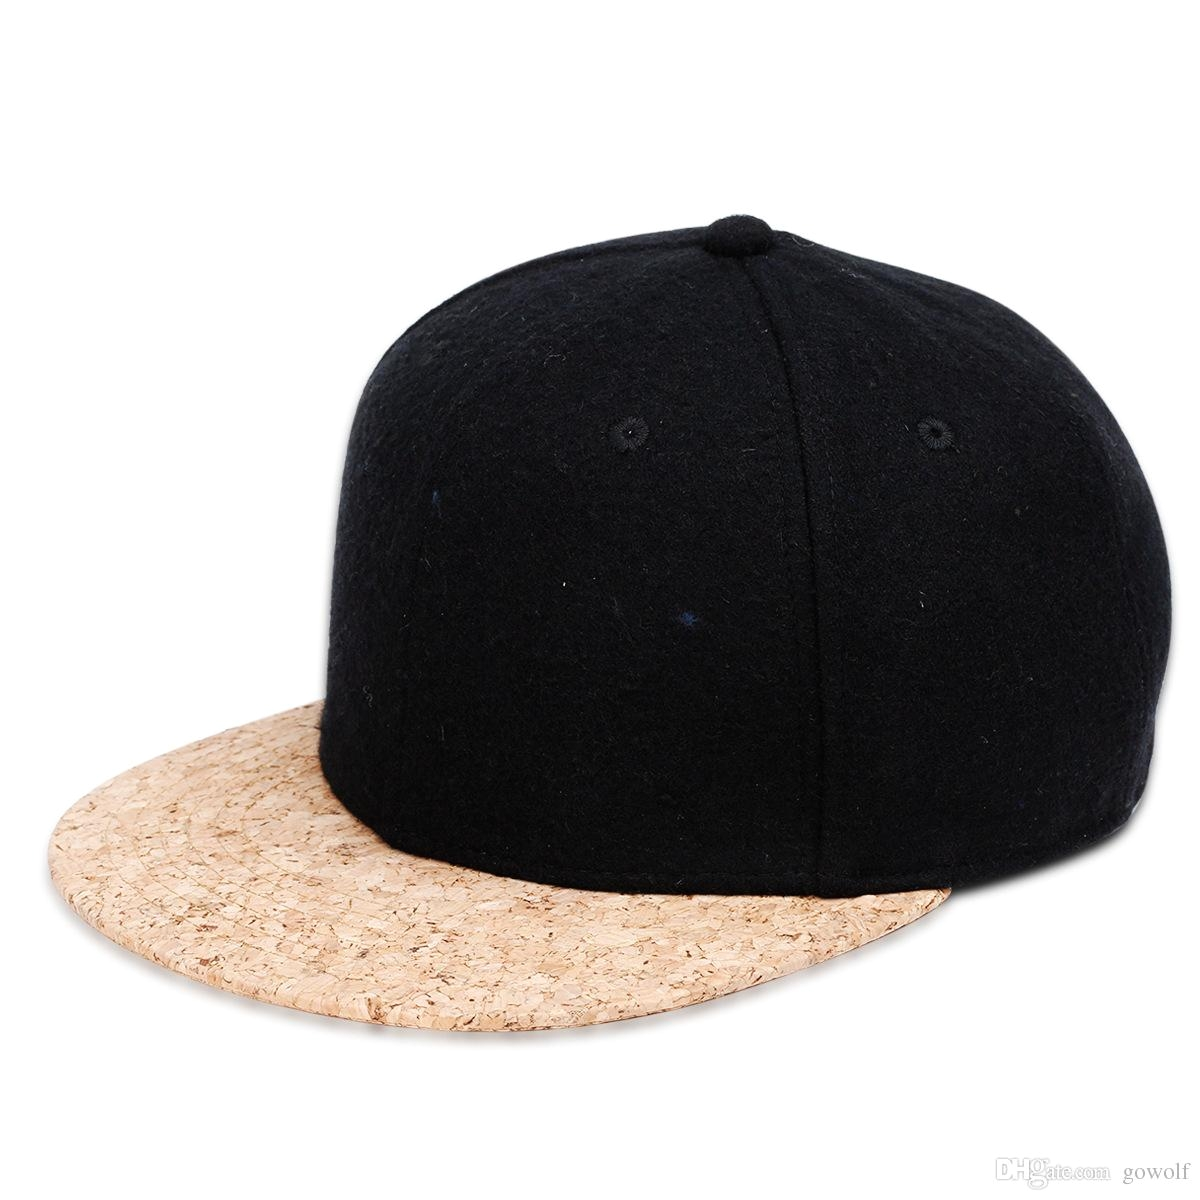 new arrival cork brim baseball cap snapback hat men women handsome wool suiting light board adjustable hip hop hat cool leisure cap cork snapback snapback